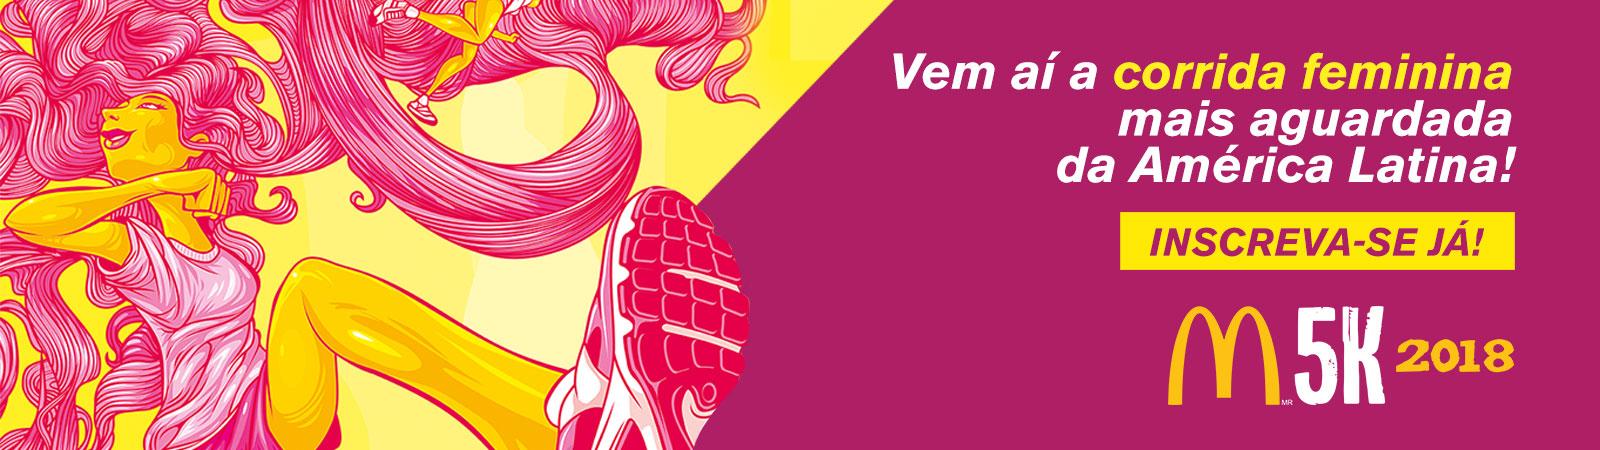 CORRIDA E CAMINHADA FEMININA McDonald's 5K 2018 - RECIFE